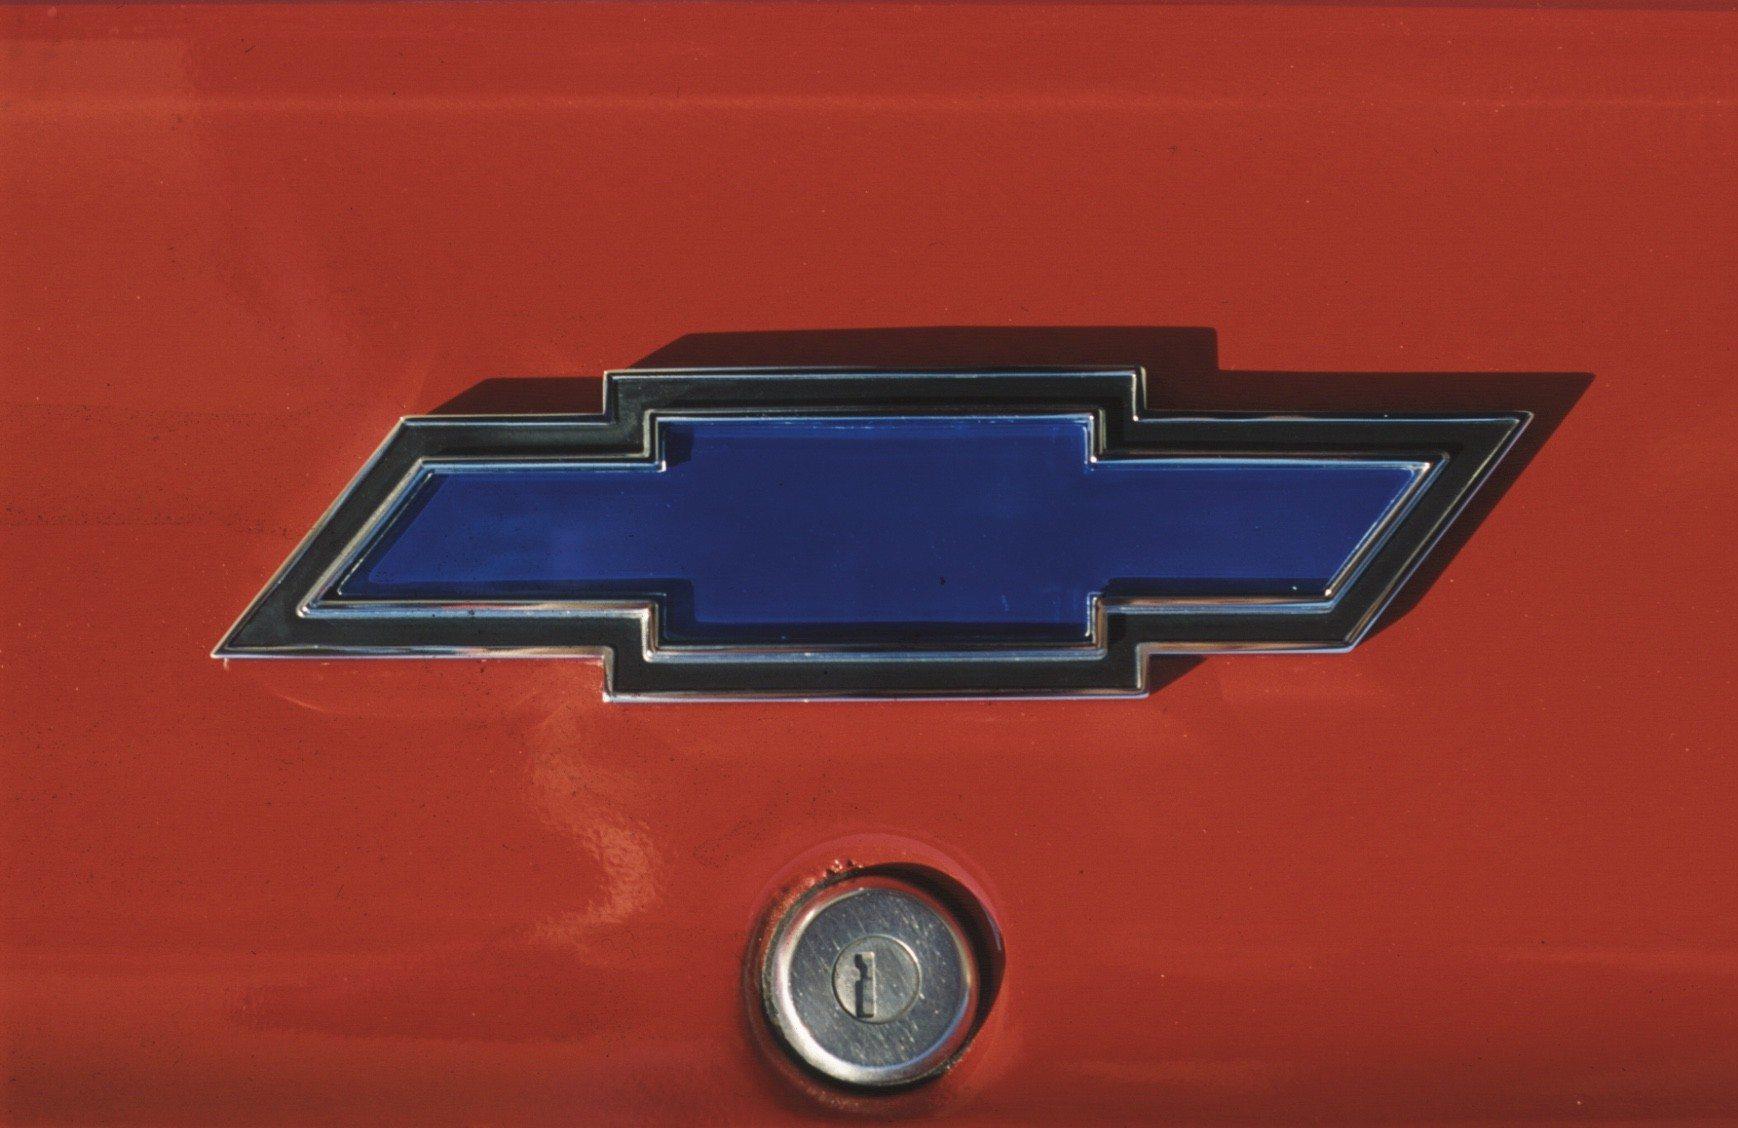 1969 Chevy Camaro 307 Blue Bowtie Badge